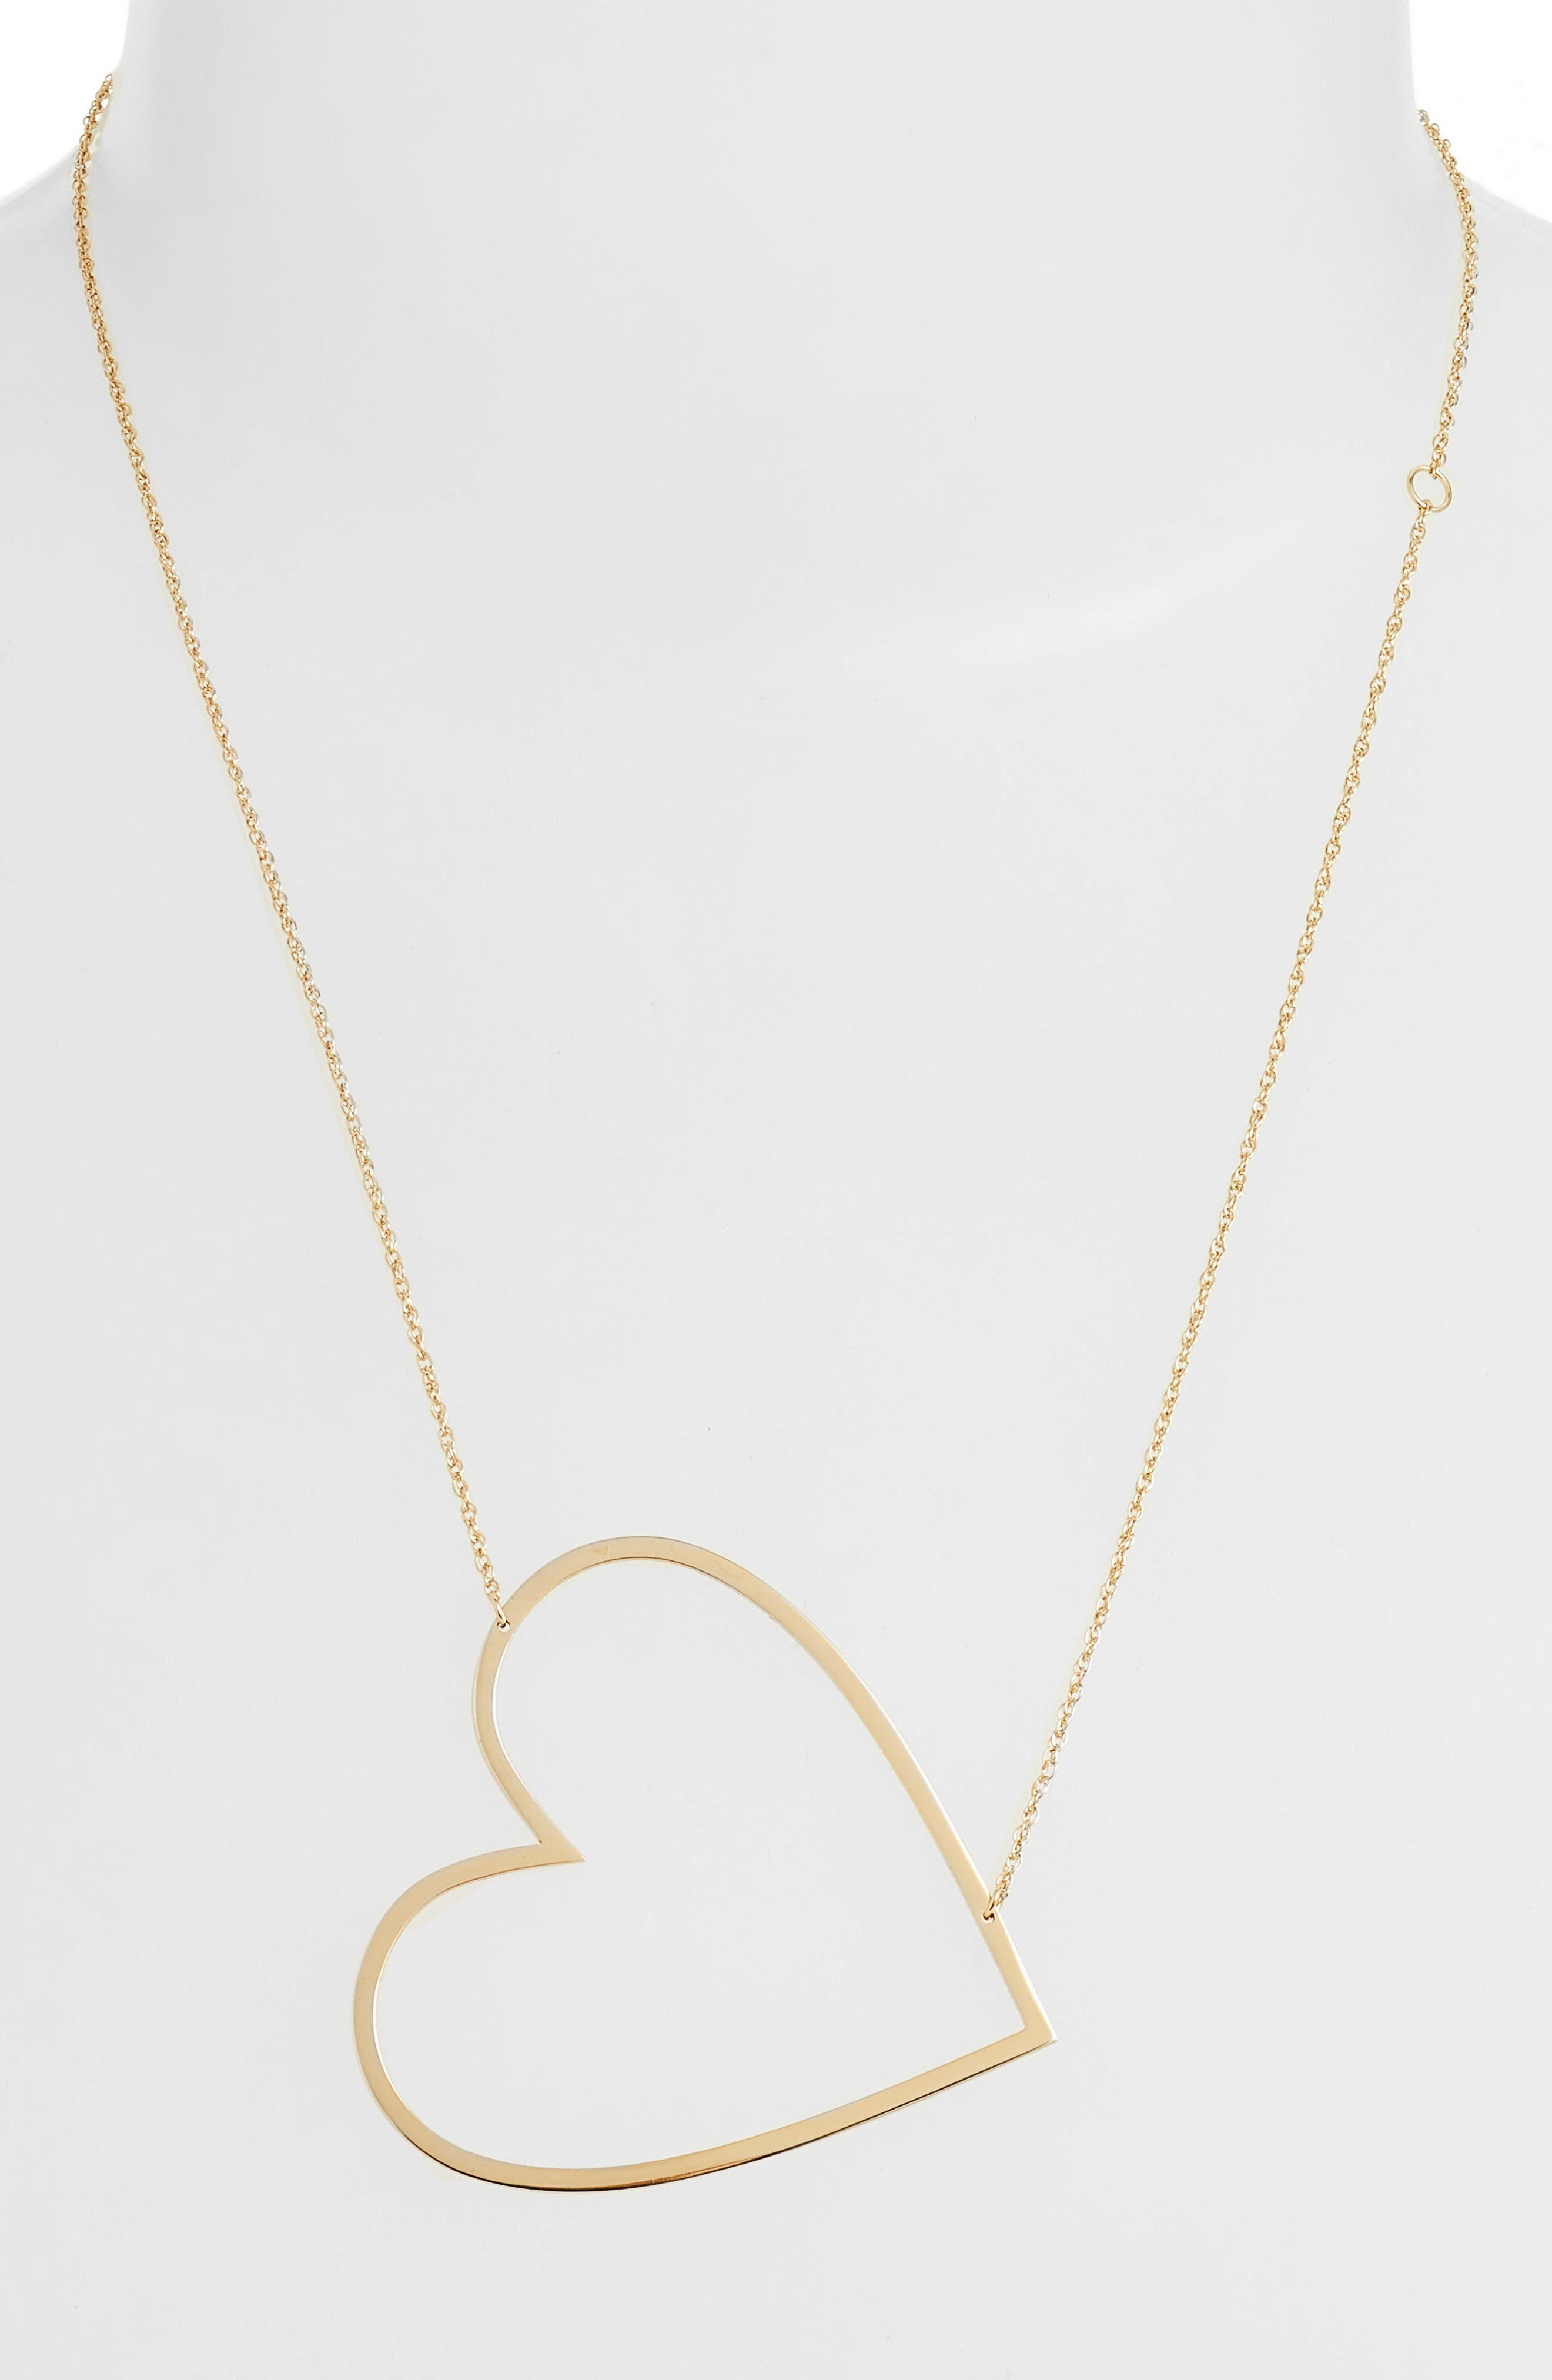 JENNIFER ZEUNER, Marissa Heart Pendant Necklace, Alternate thumbnail 2, color, YELLOW VERMEIL